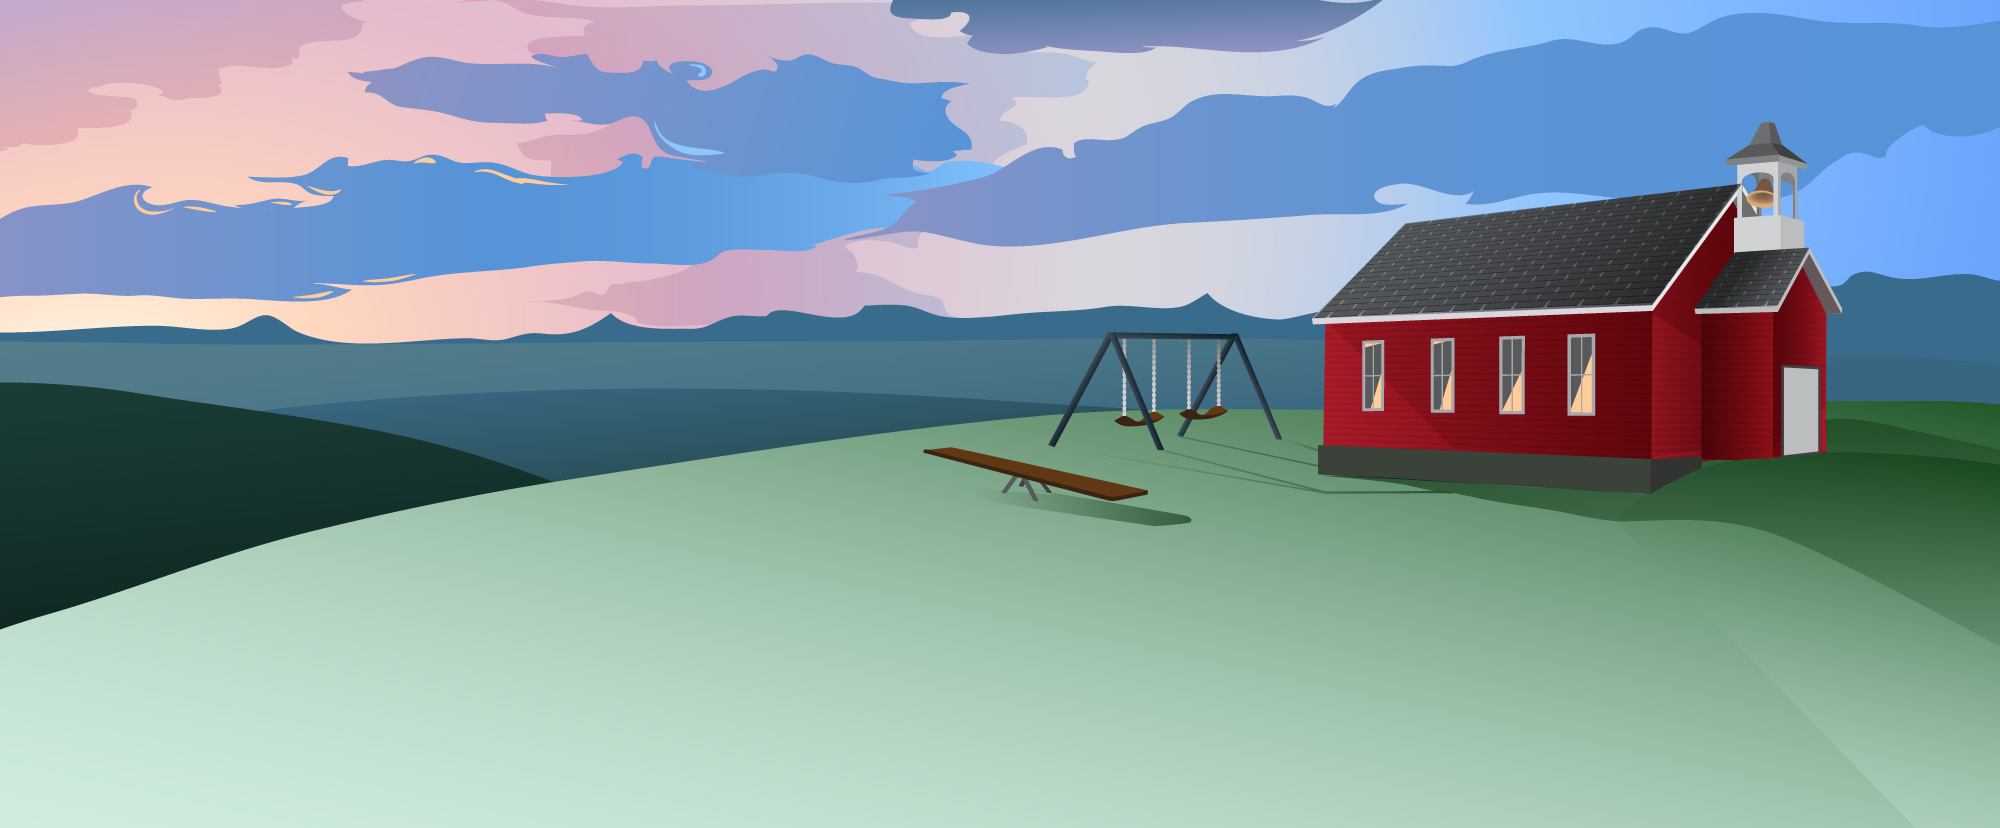 CMU-Schoolhouse-illustration